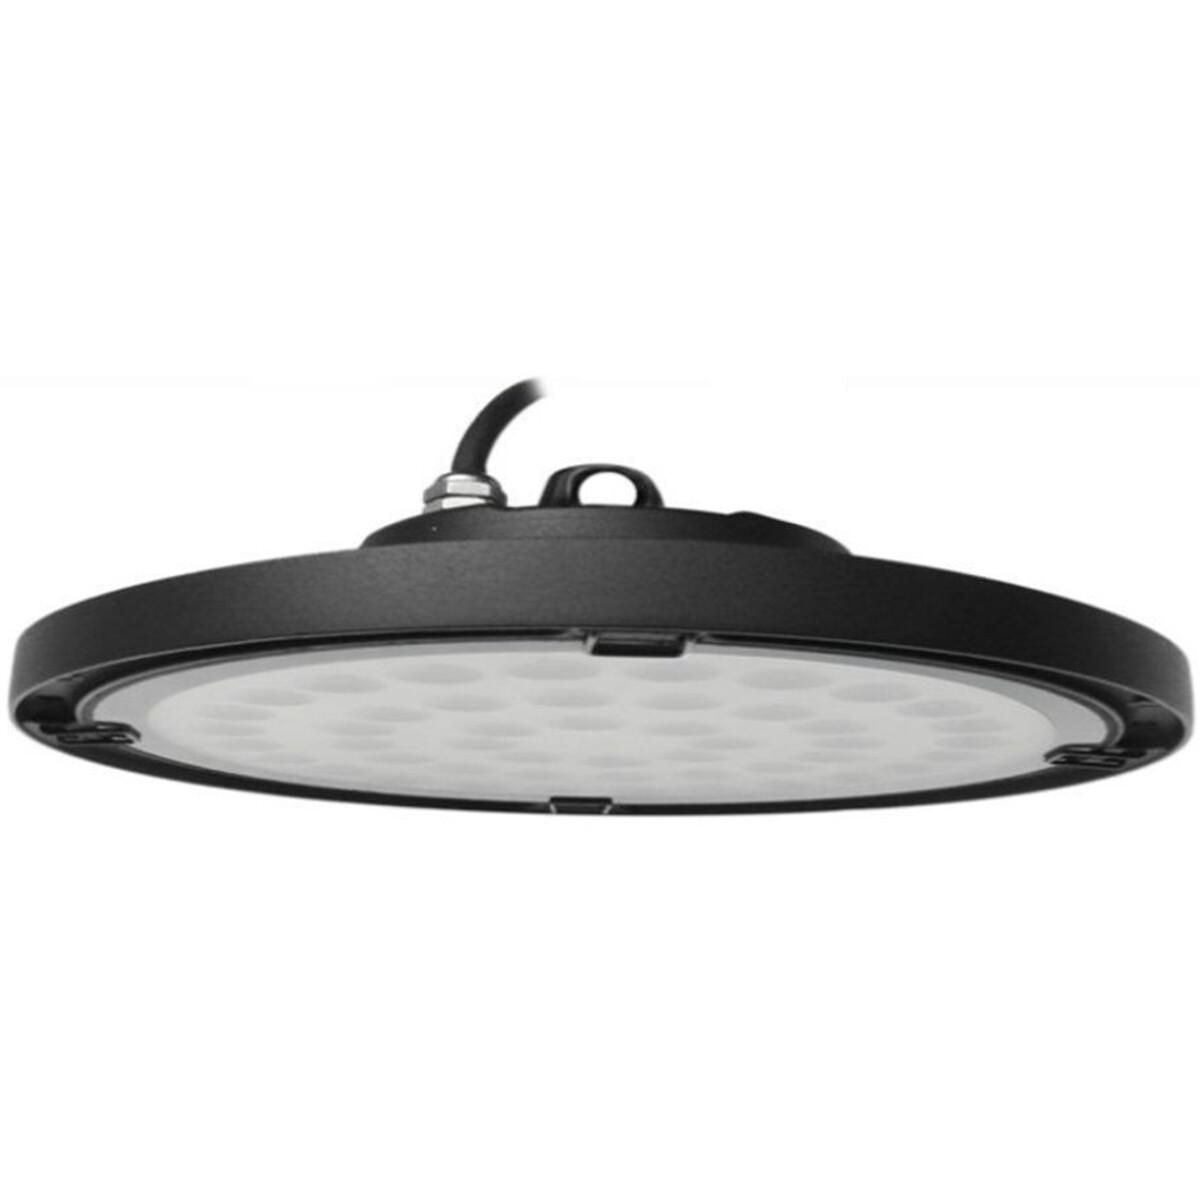 OSRAM - LED UFO High Bay 150W - Magazijnverlichting - Waterdicht IP65 - Natuurlijk Wit 4000K - Alumi